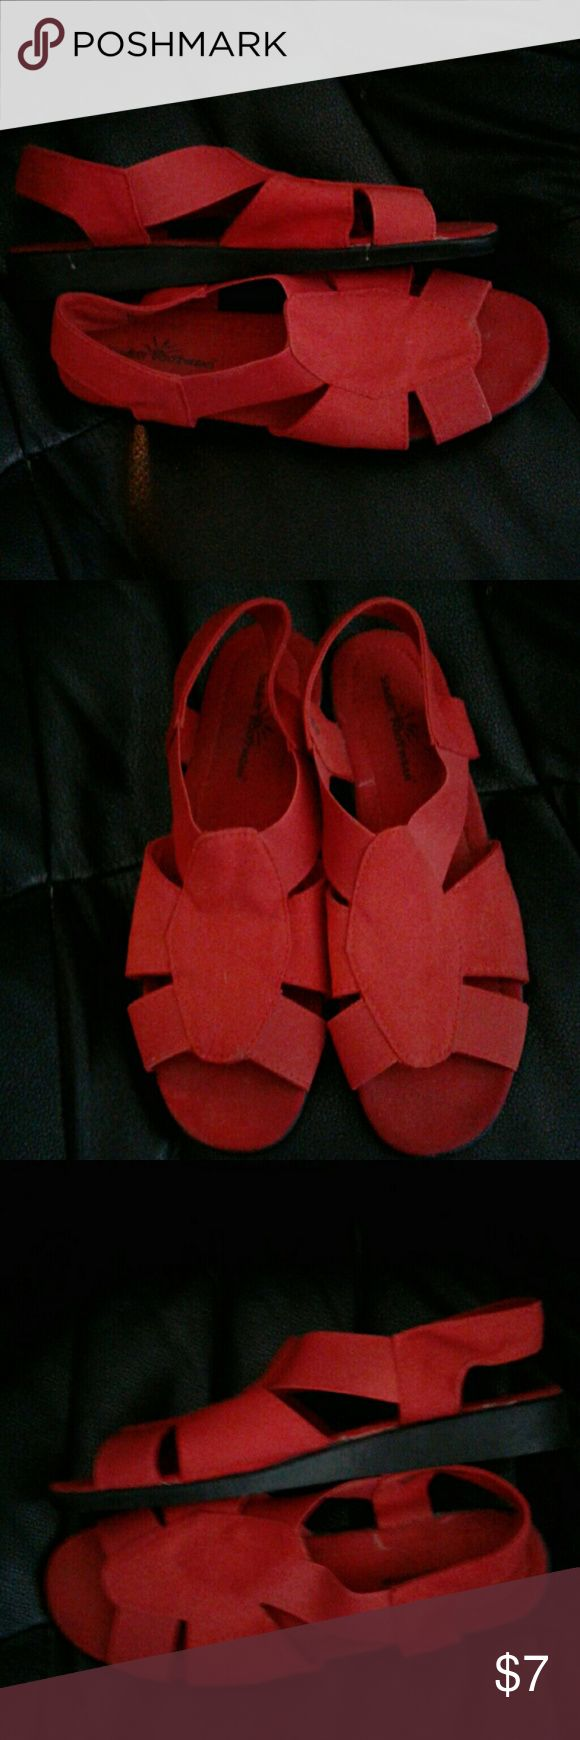 SunBay Footwear Red Canvas slingback sandals Hardly worn Red Canvas slingback sandals with elasticized strap SunBay Shoes Sandals